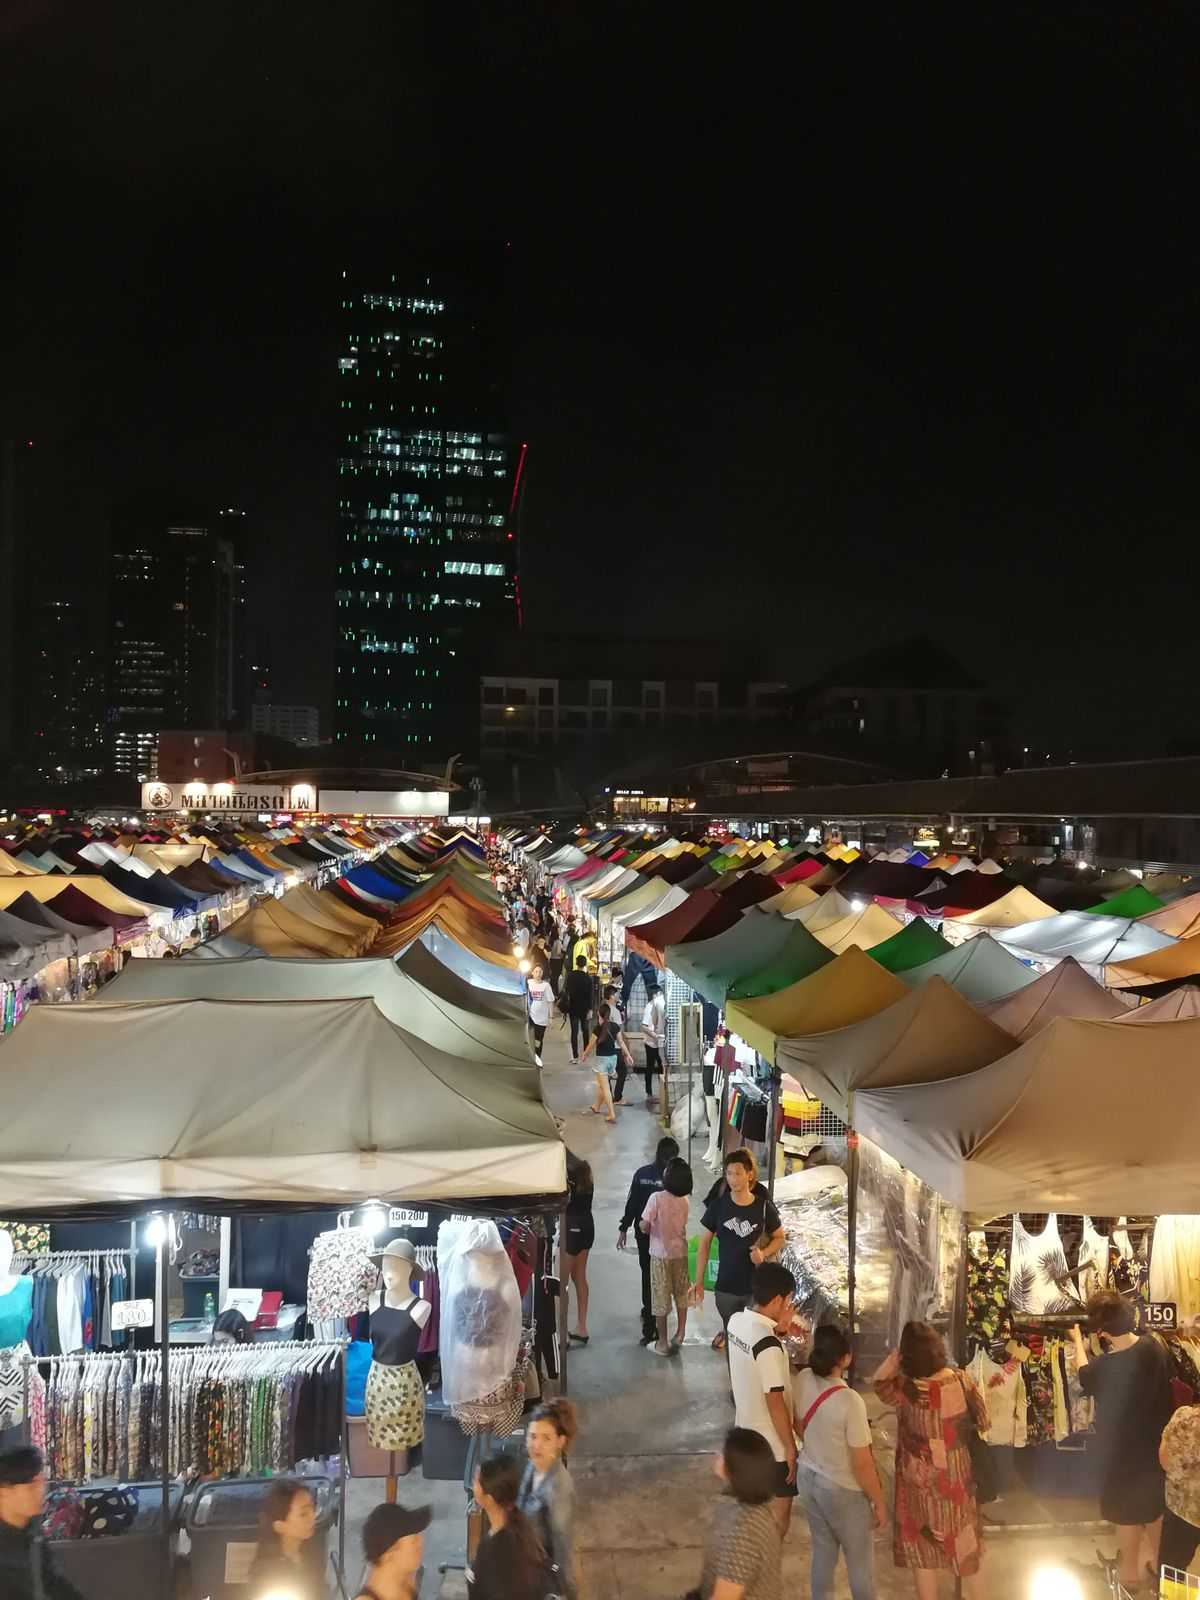 Éjszaka piacozni menő